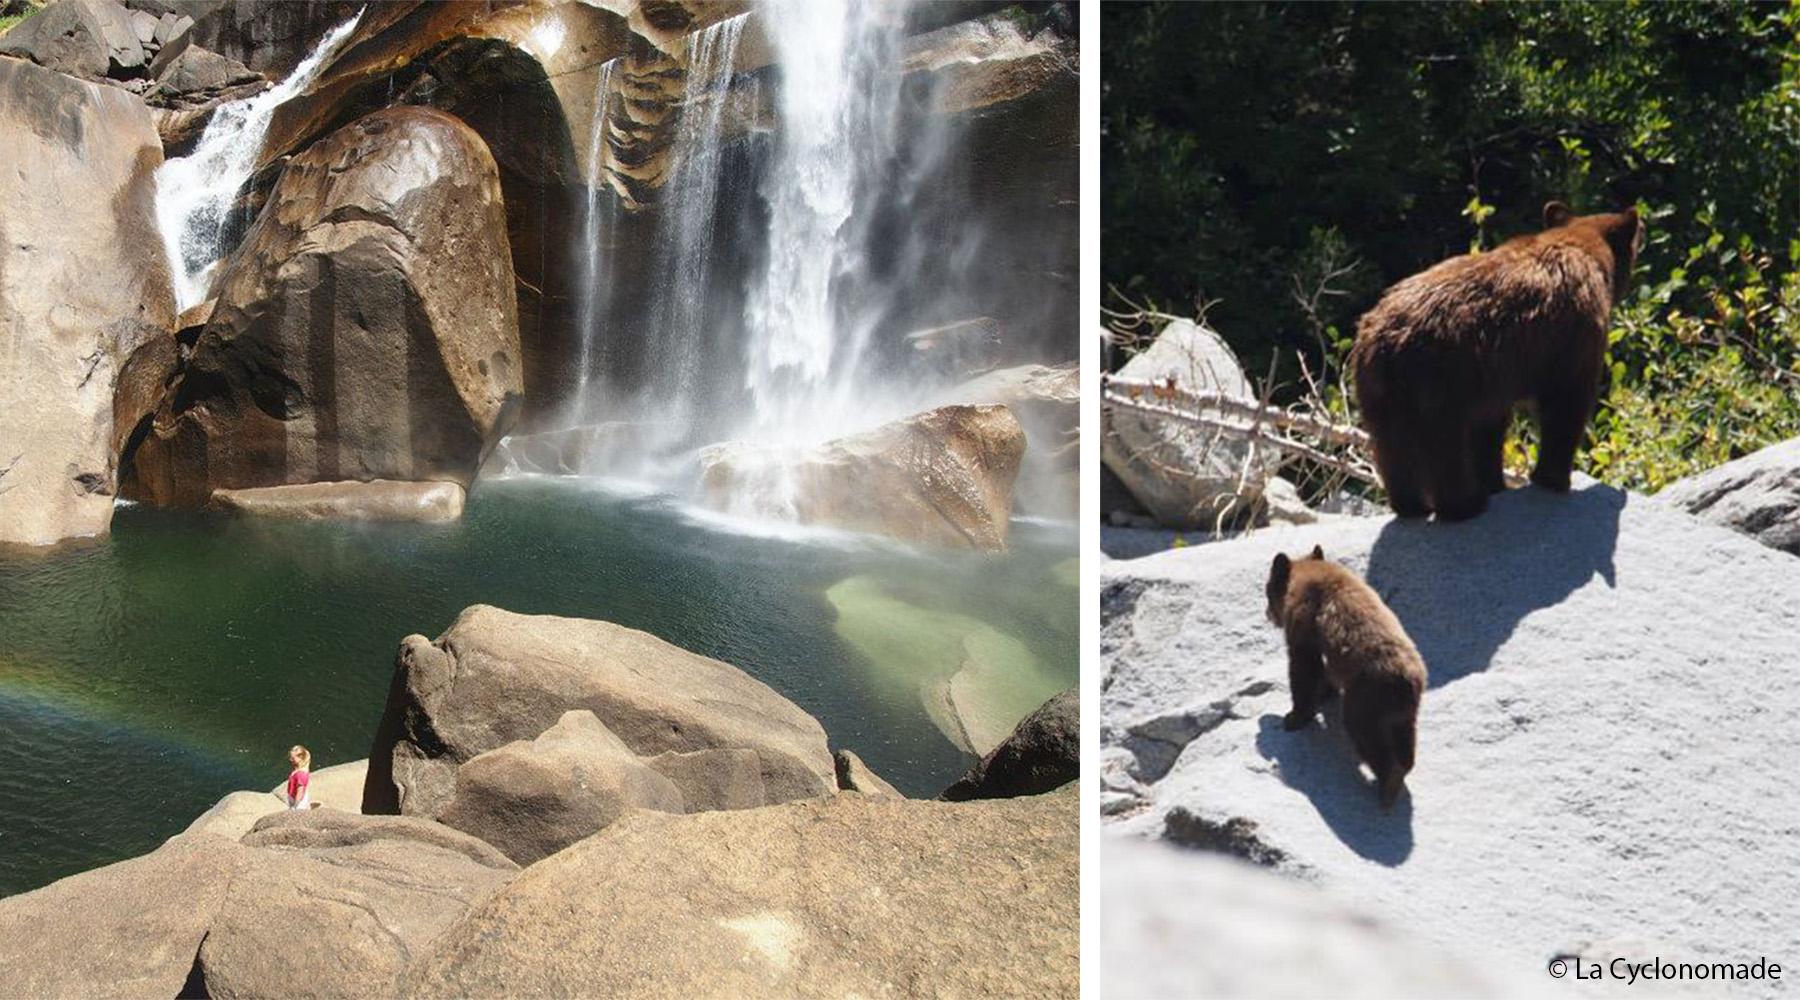 yosemite-chinook-voyaye-ouest-americain-parcs-nationaux-la-cyclonomade-ours-bruns-yosemite-falls